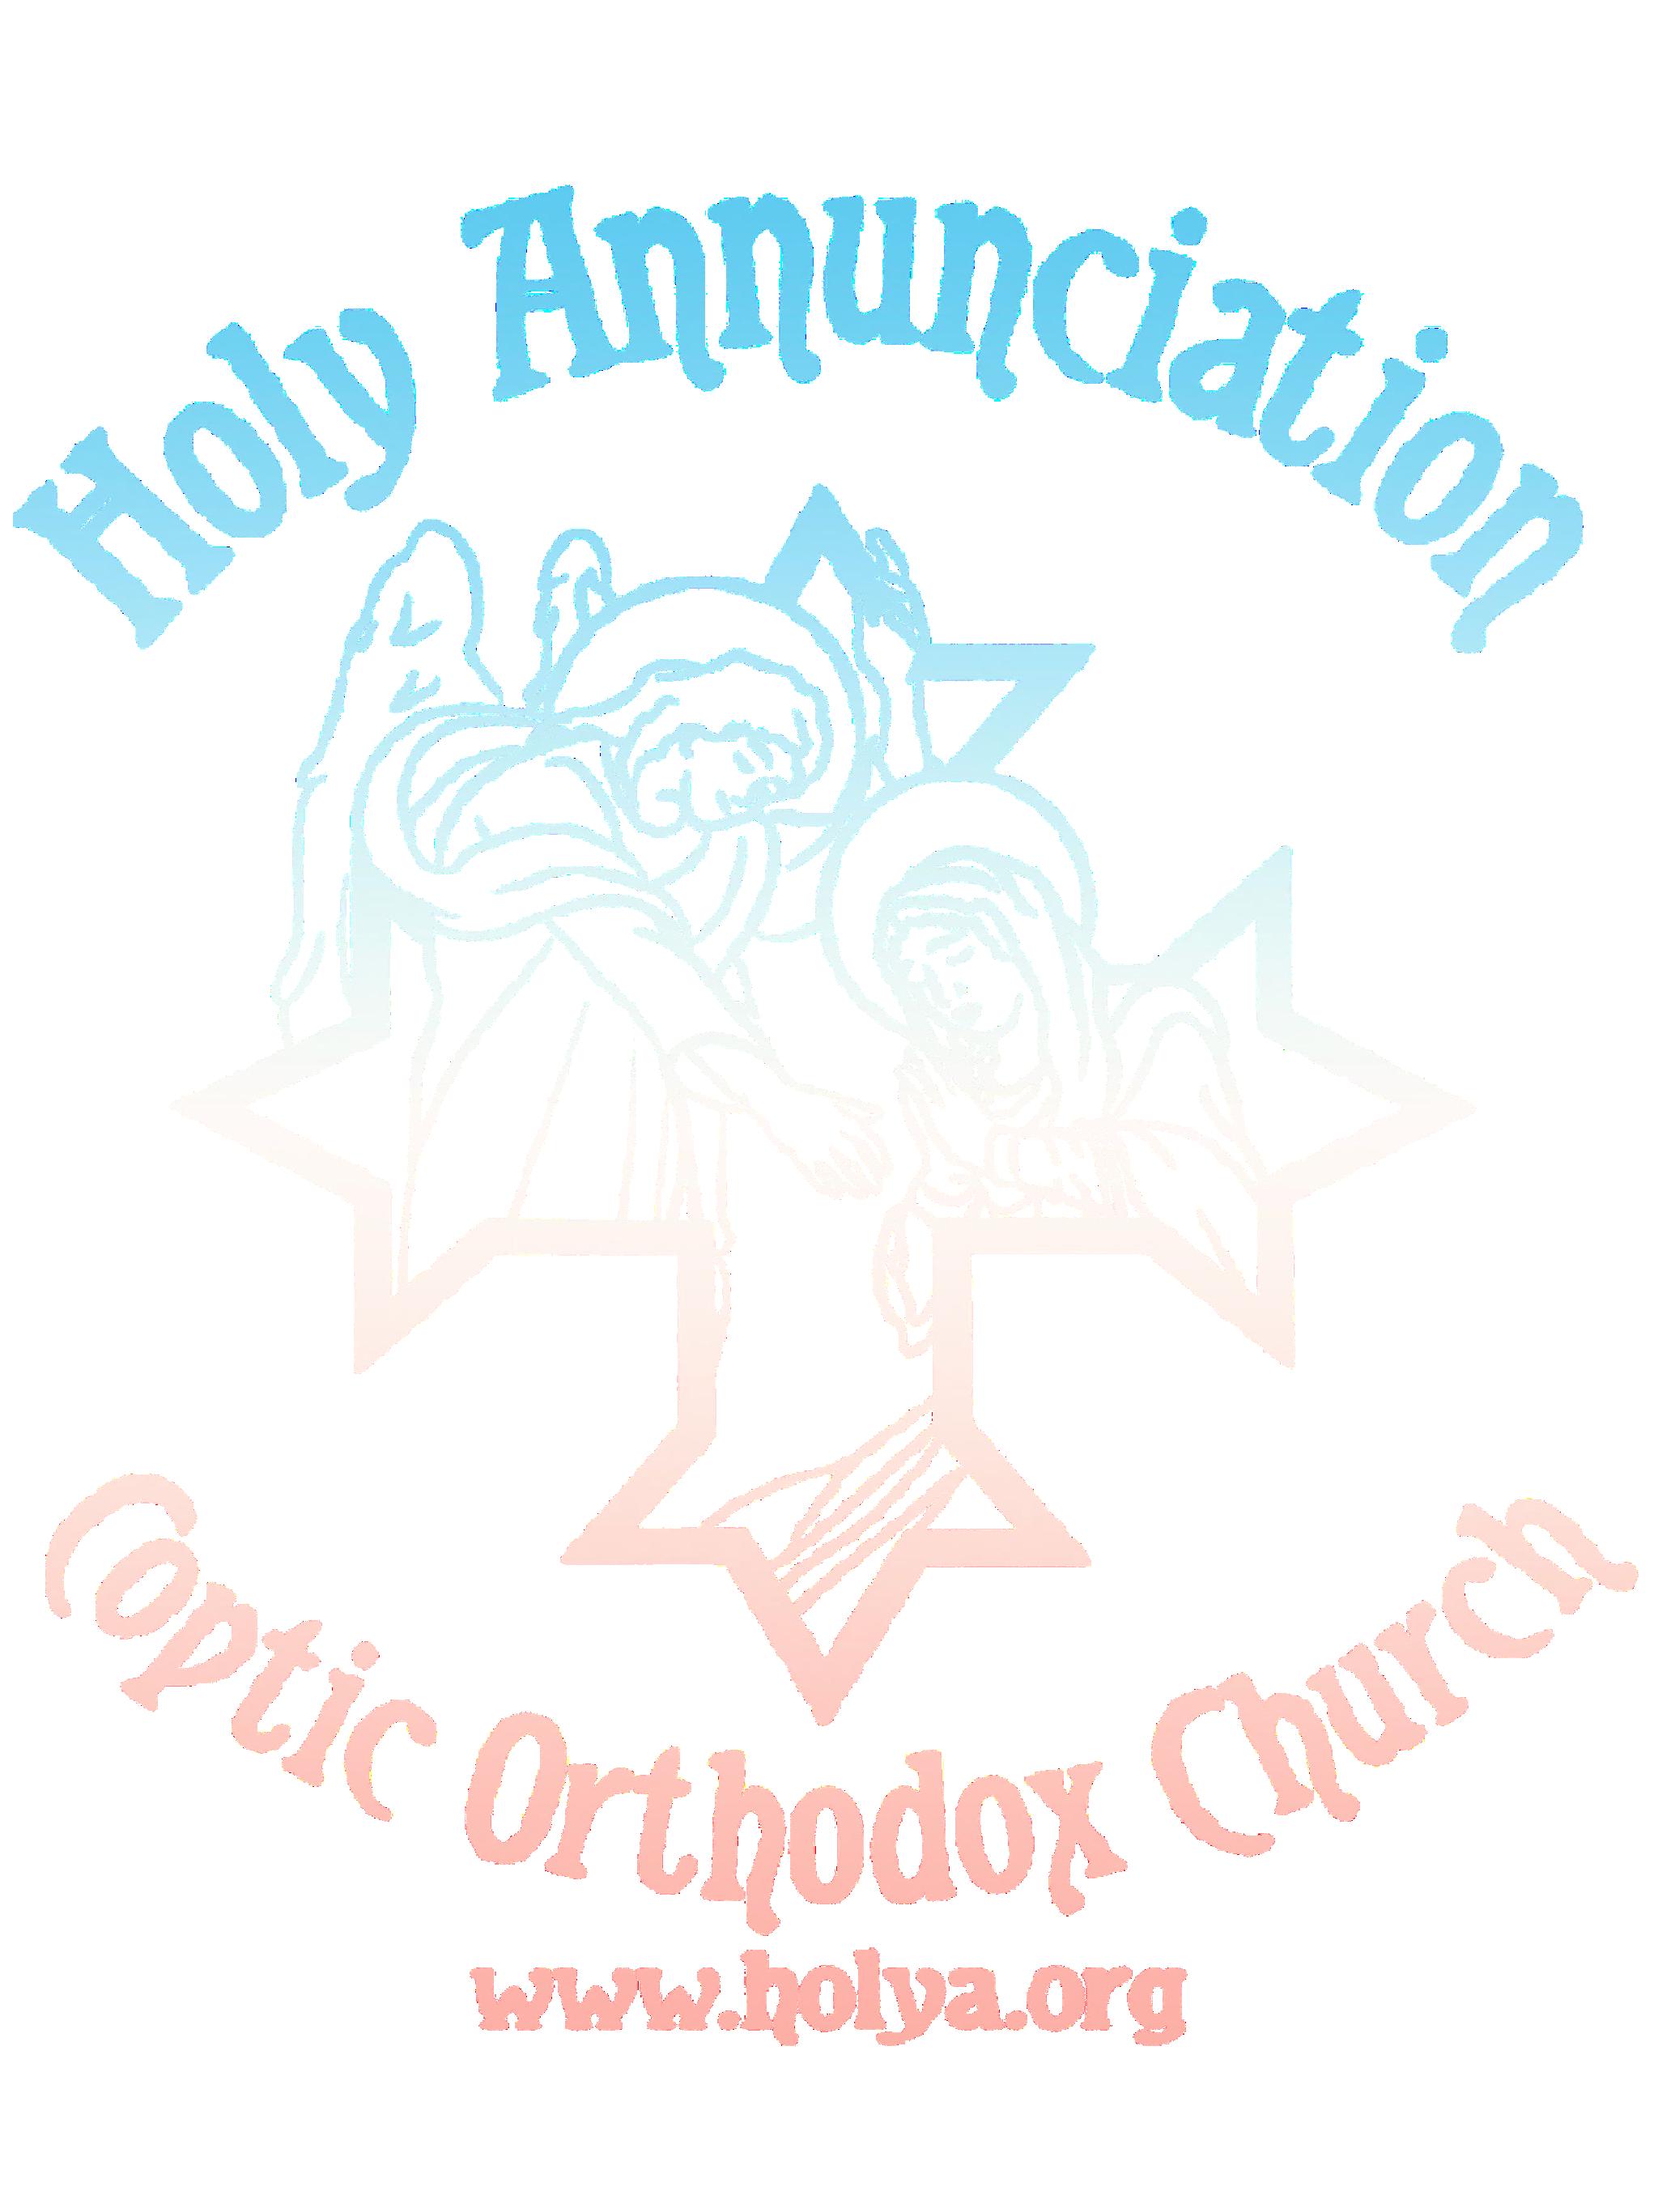 The Holy Annunciation Coptic Orthodox Church